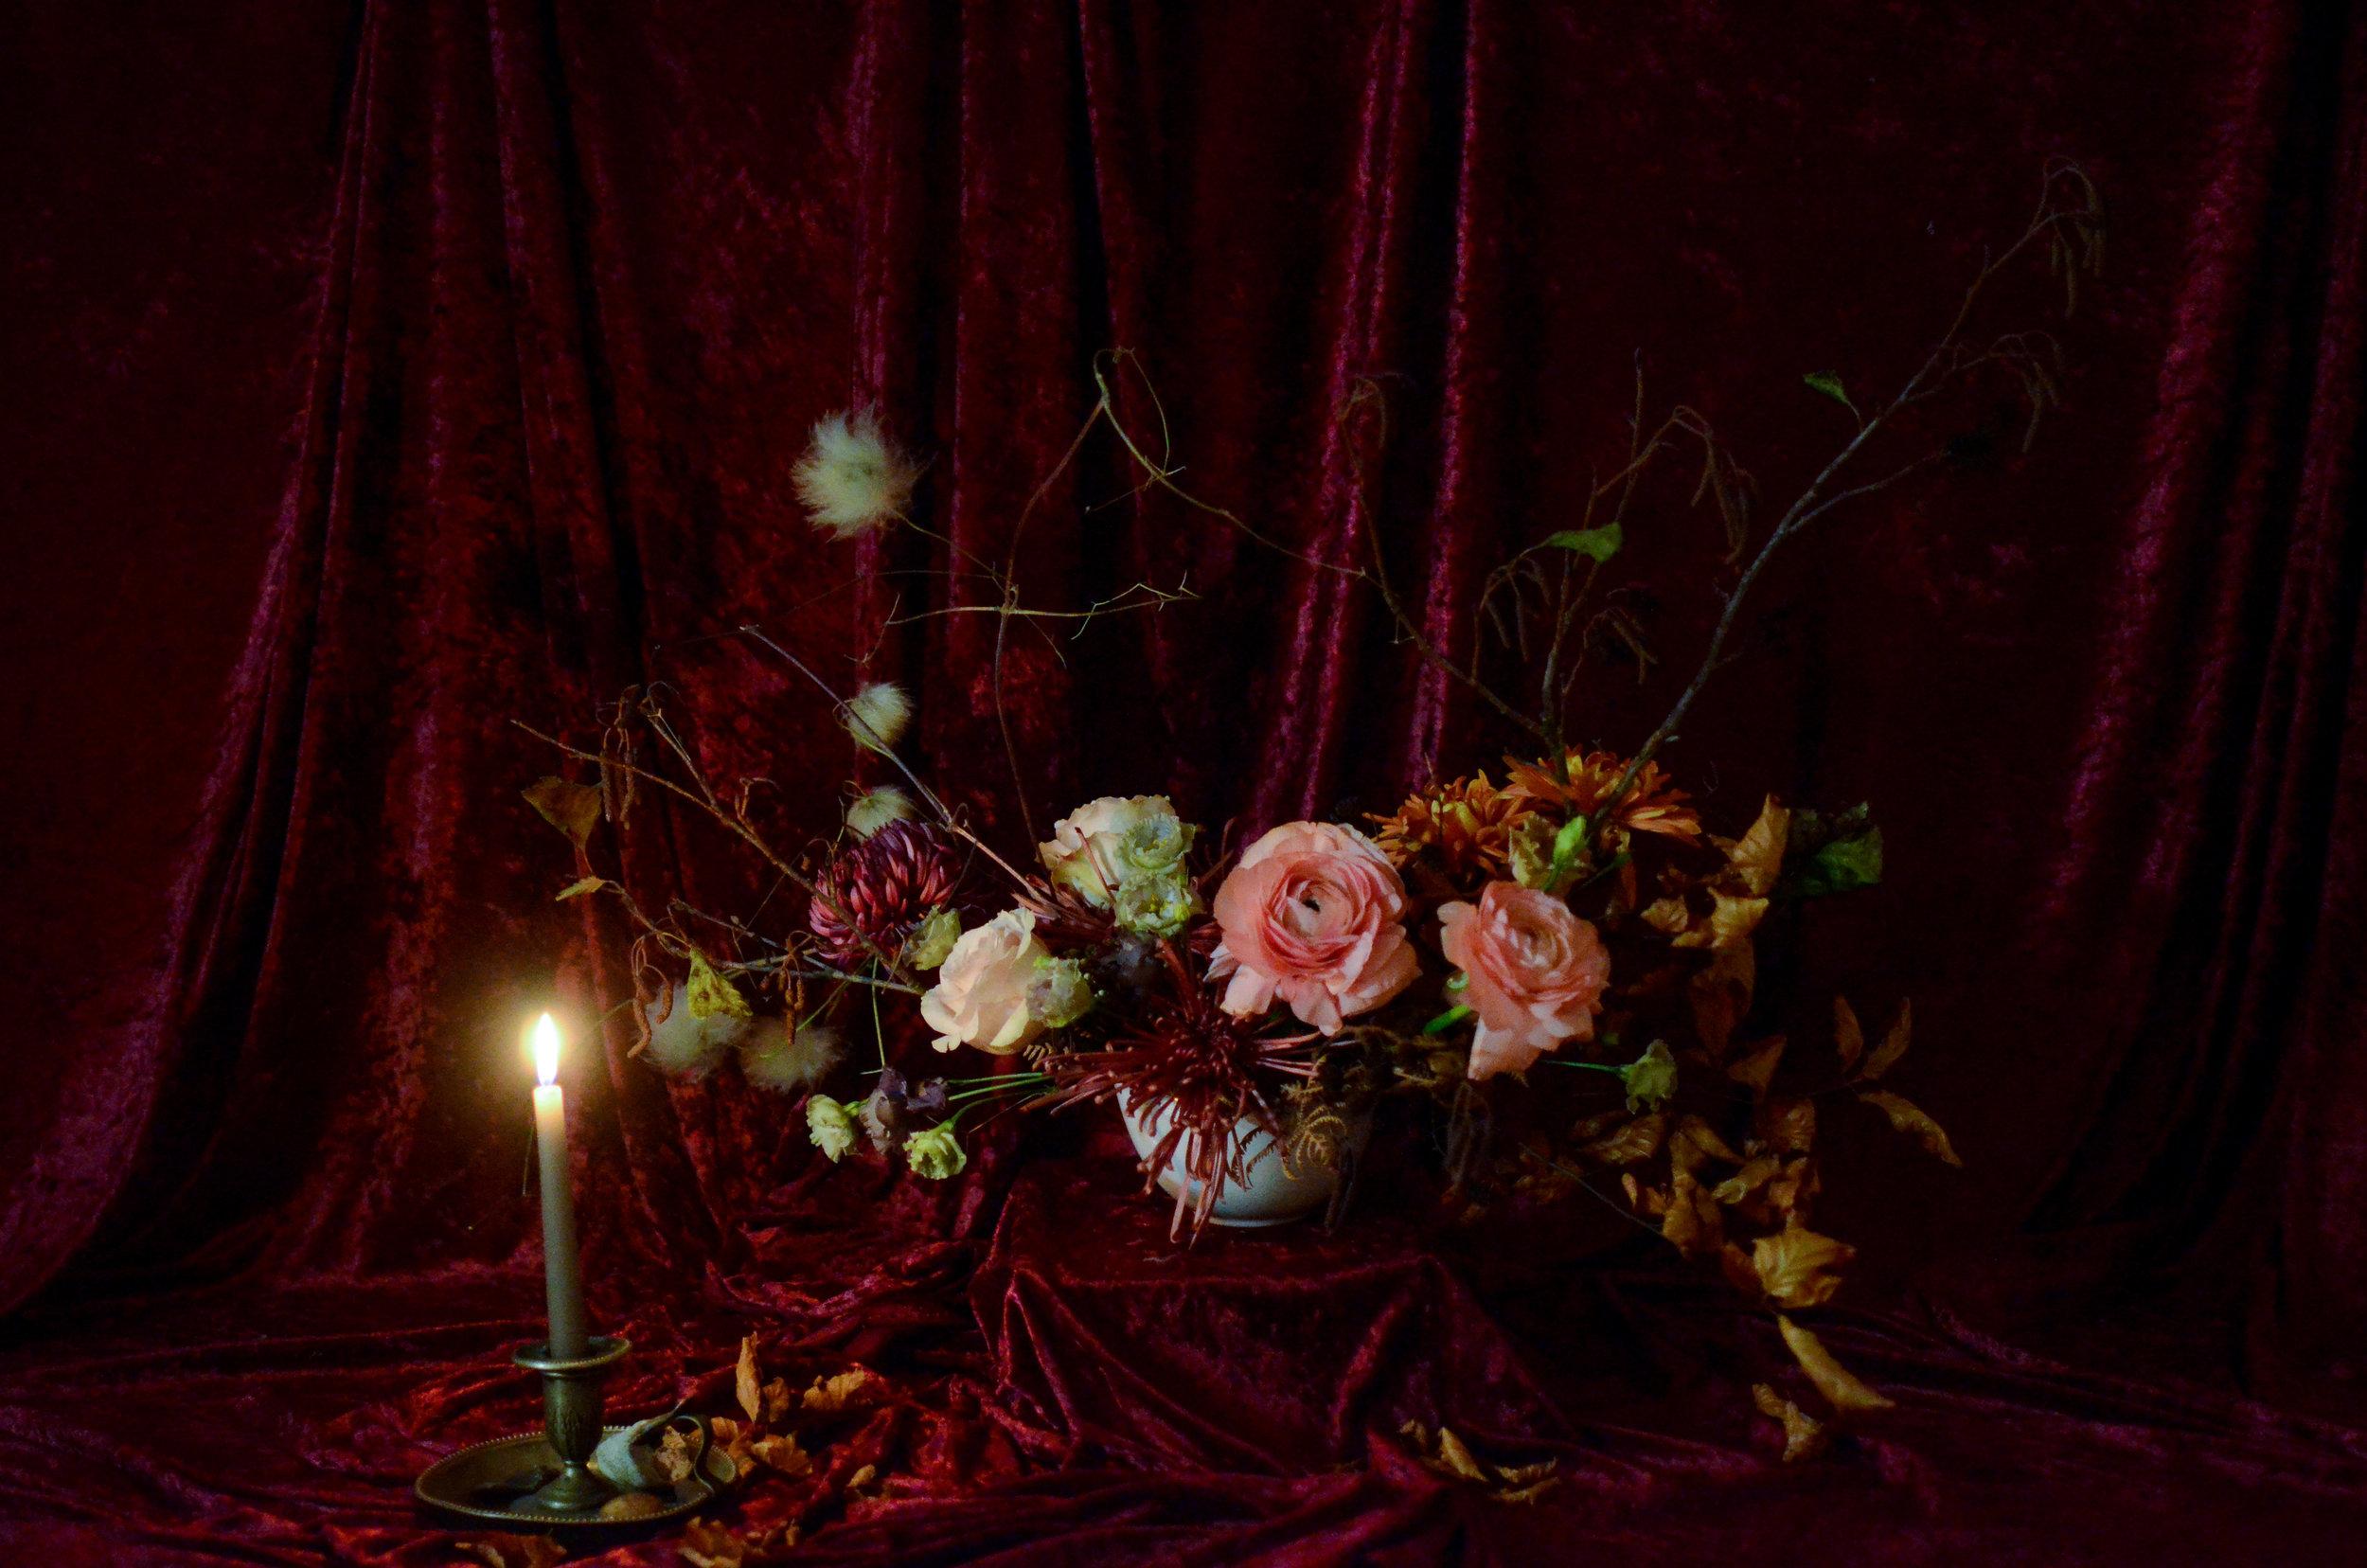 Image - Donatella at a Moss & Stone 1:2 Class | Image - Brigitte Girling